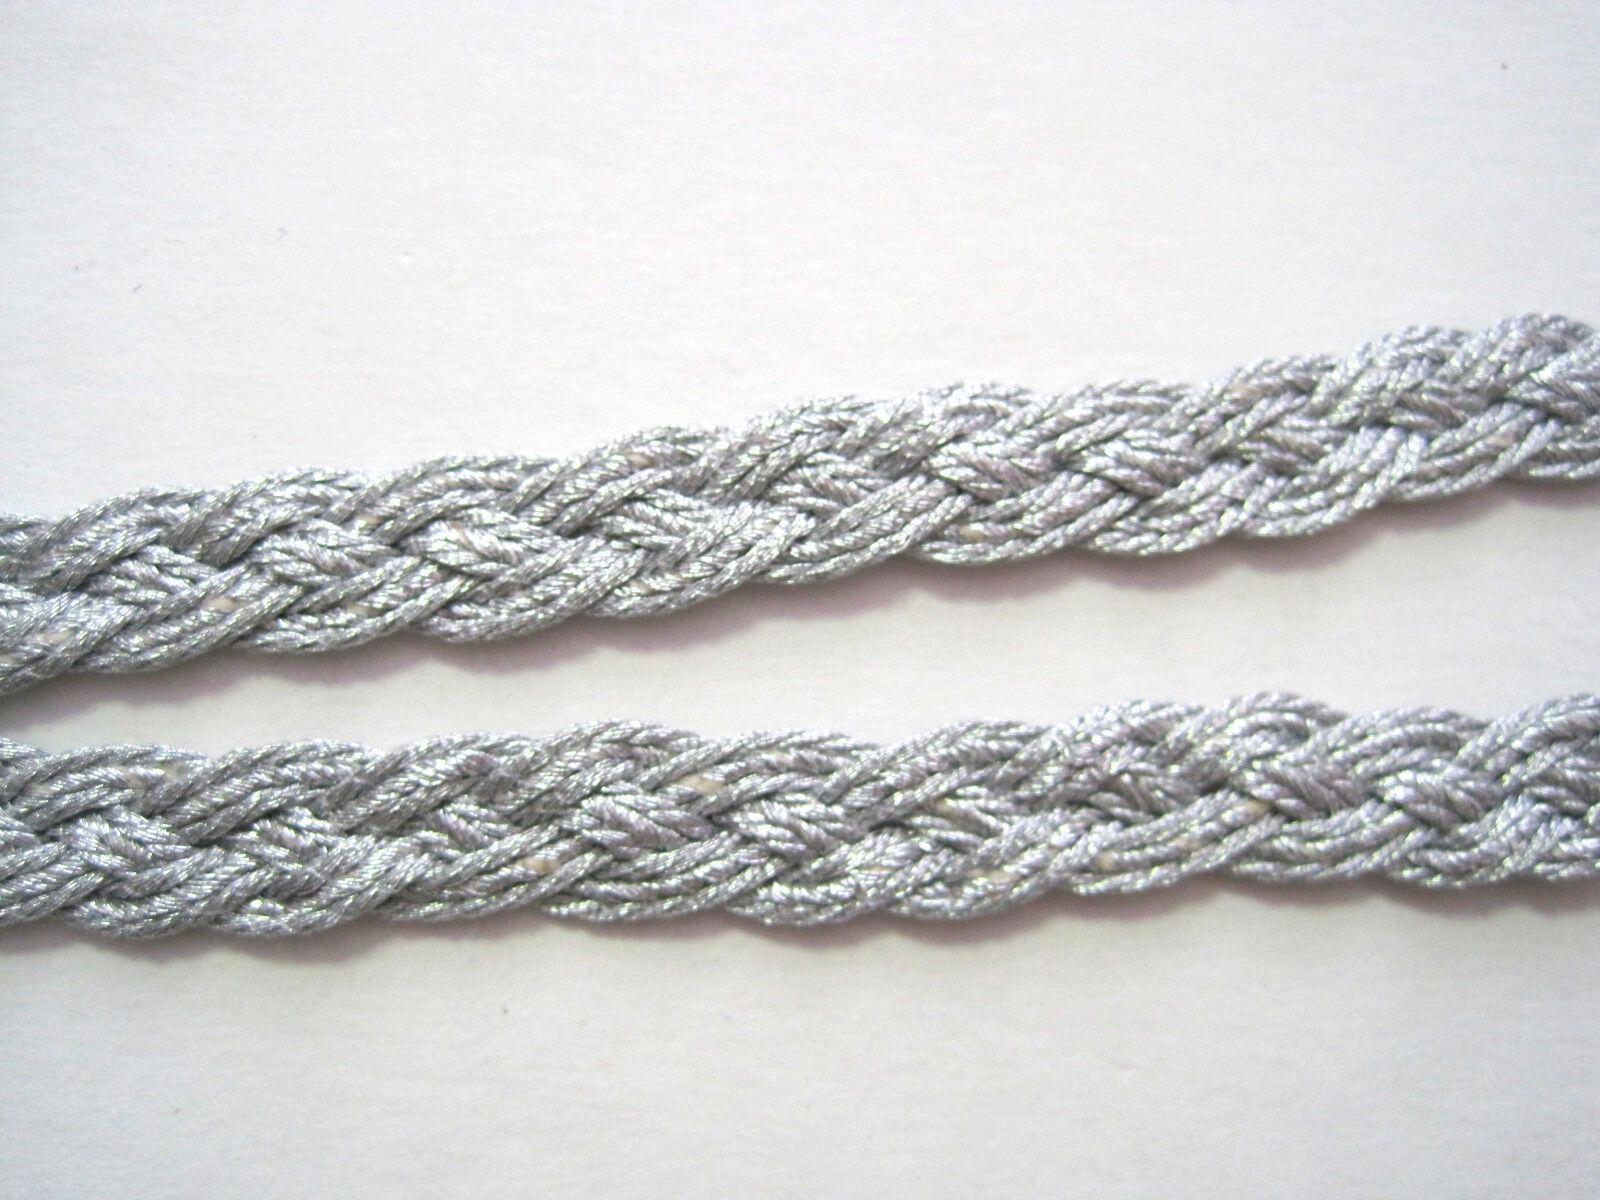 Borte Silber Geflochten Uniform BO-SB-1054